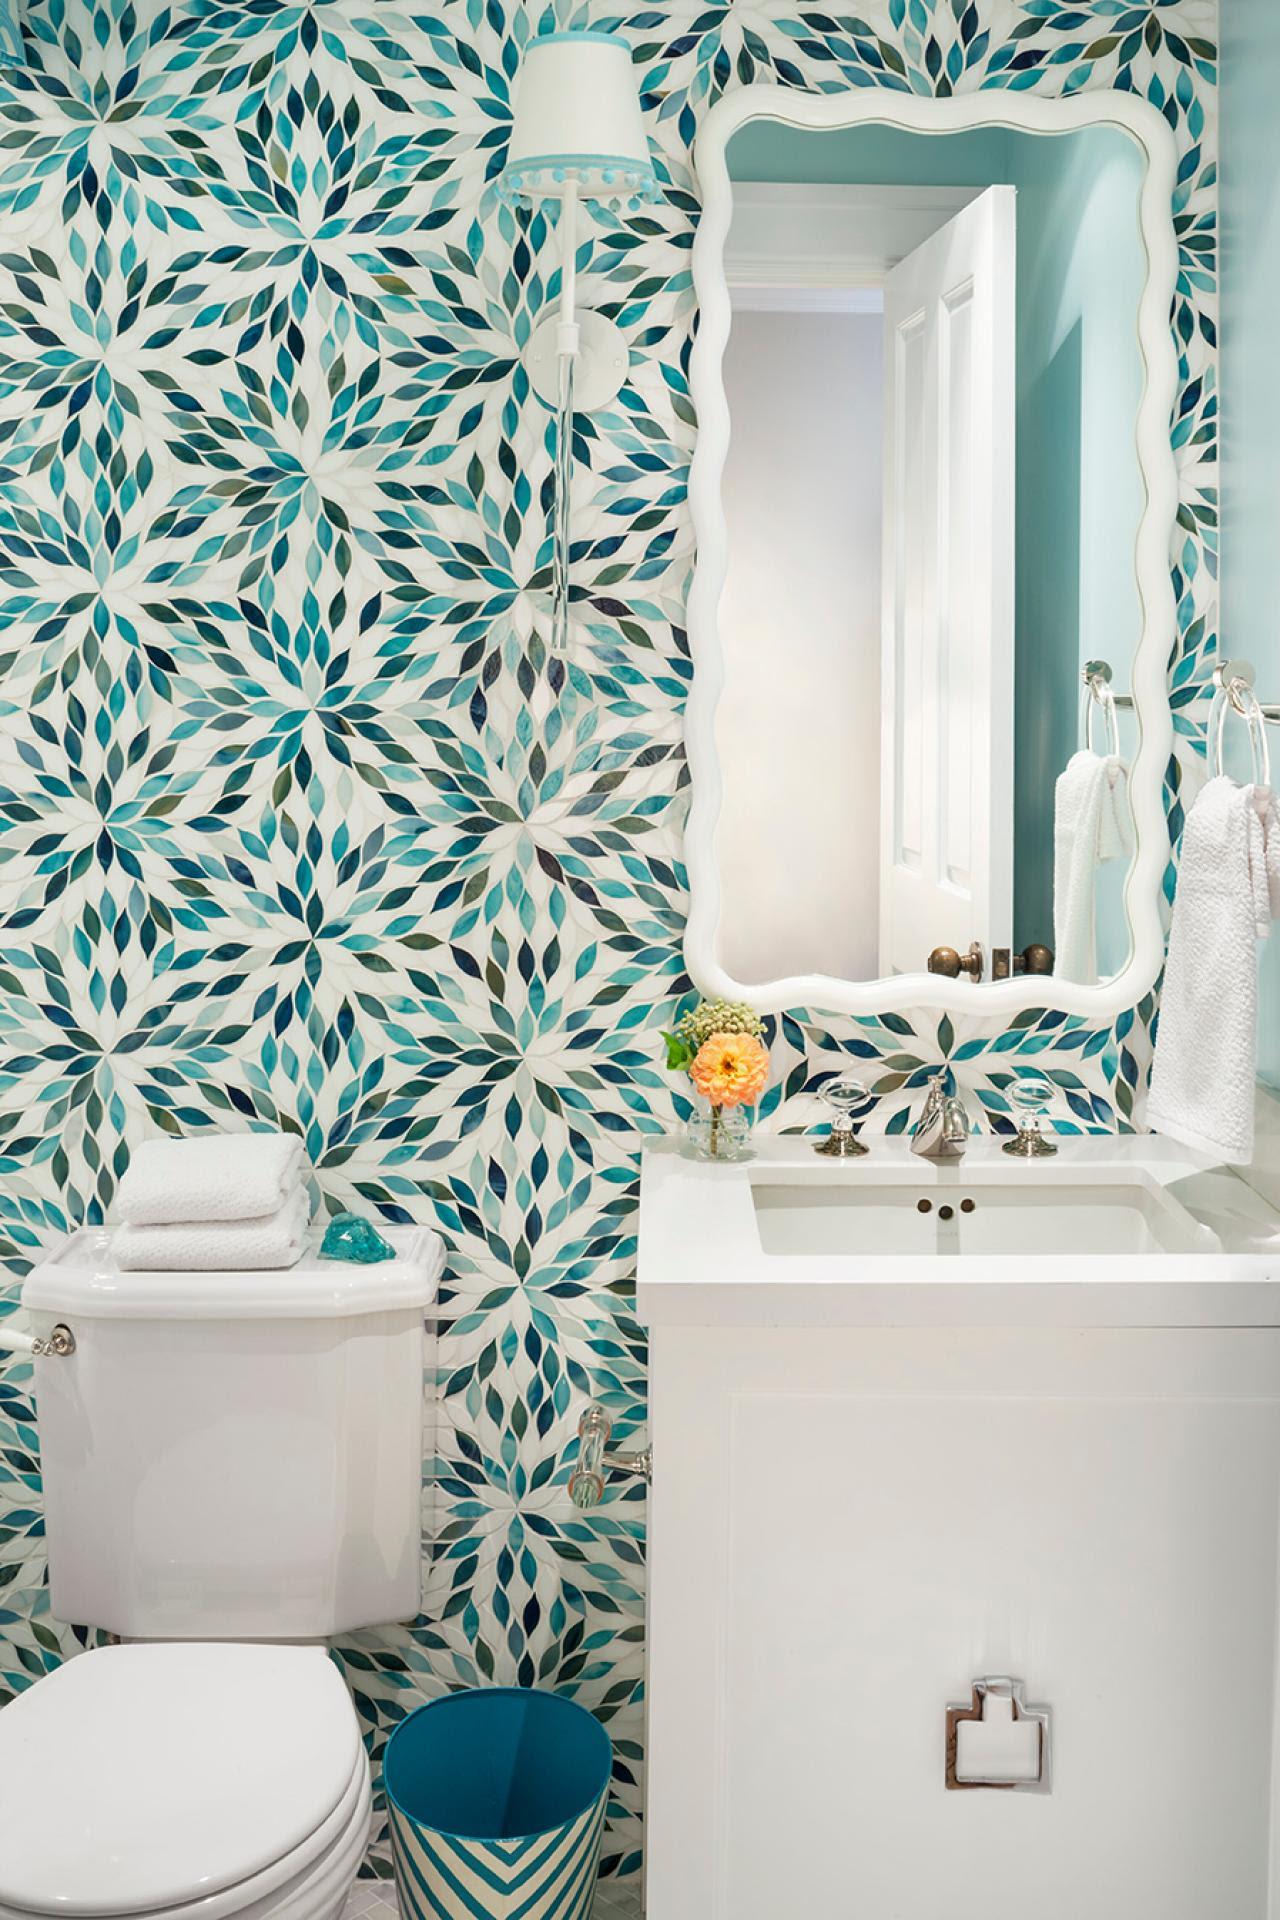 Top 20 Bathroom Tile Trends of 2017 | HGTV's Decorating ...